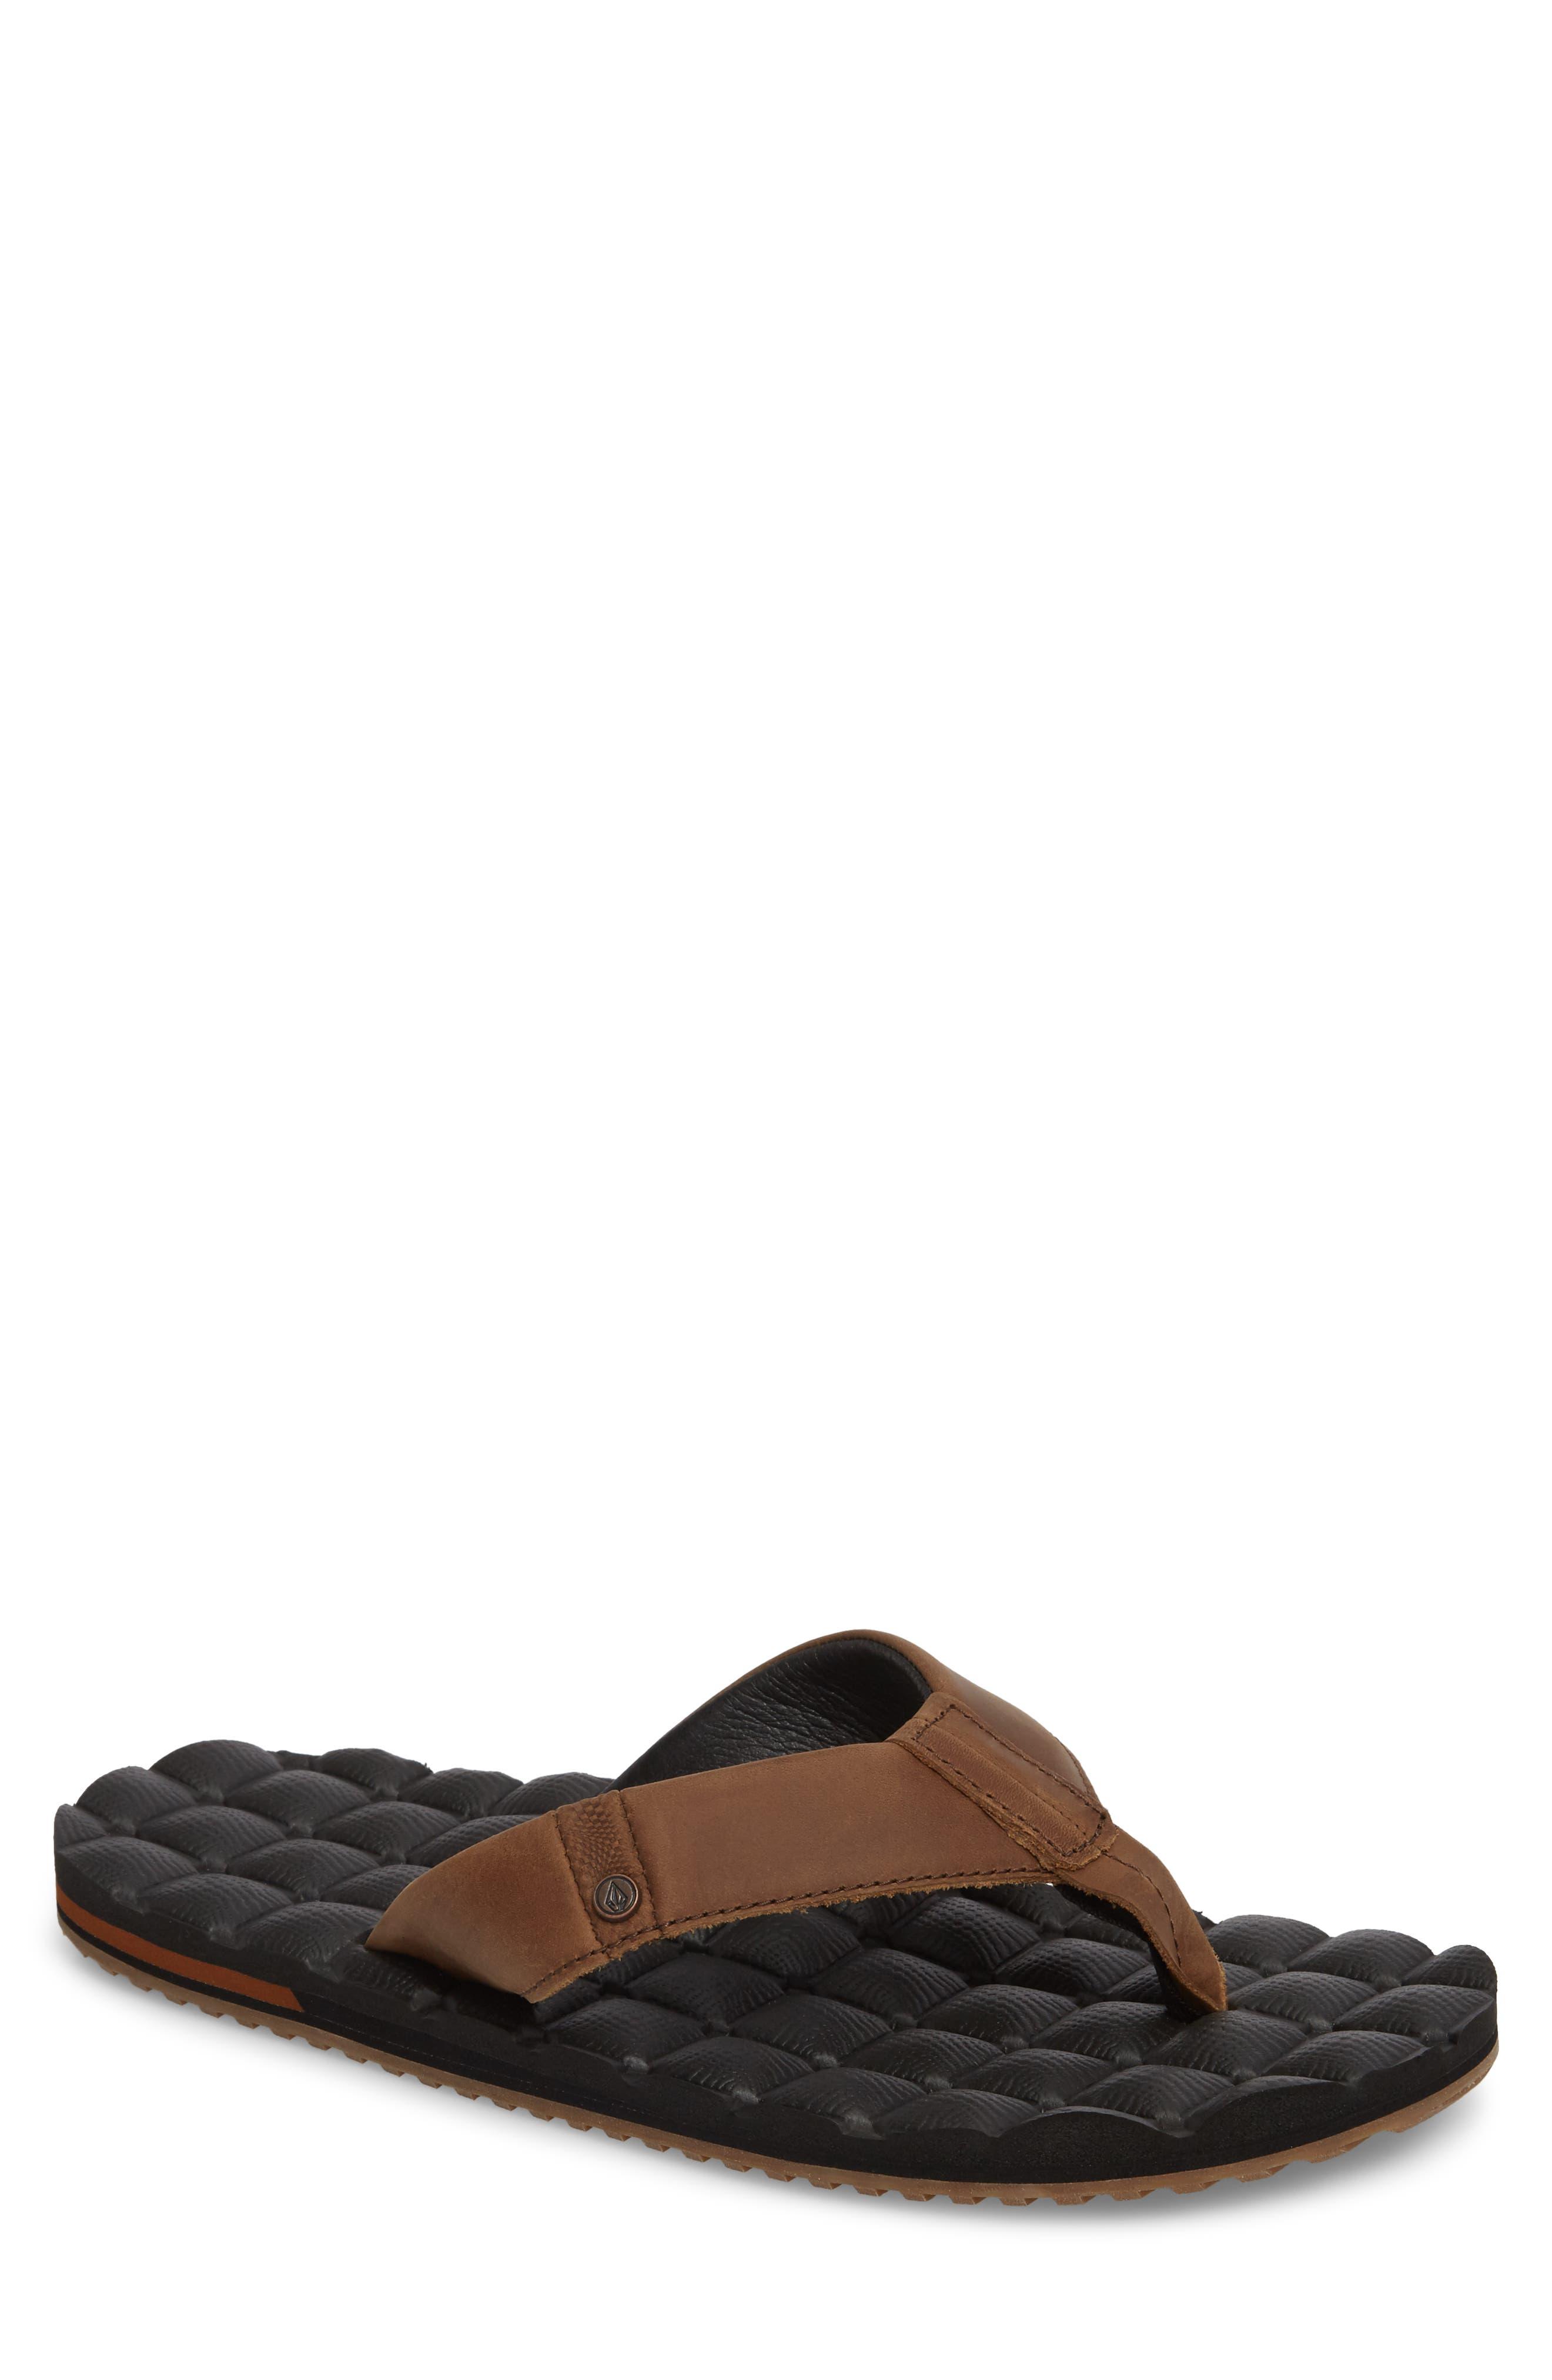 Volcom 'Recliner' Leather Flip Flop